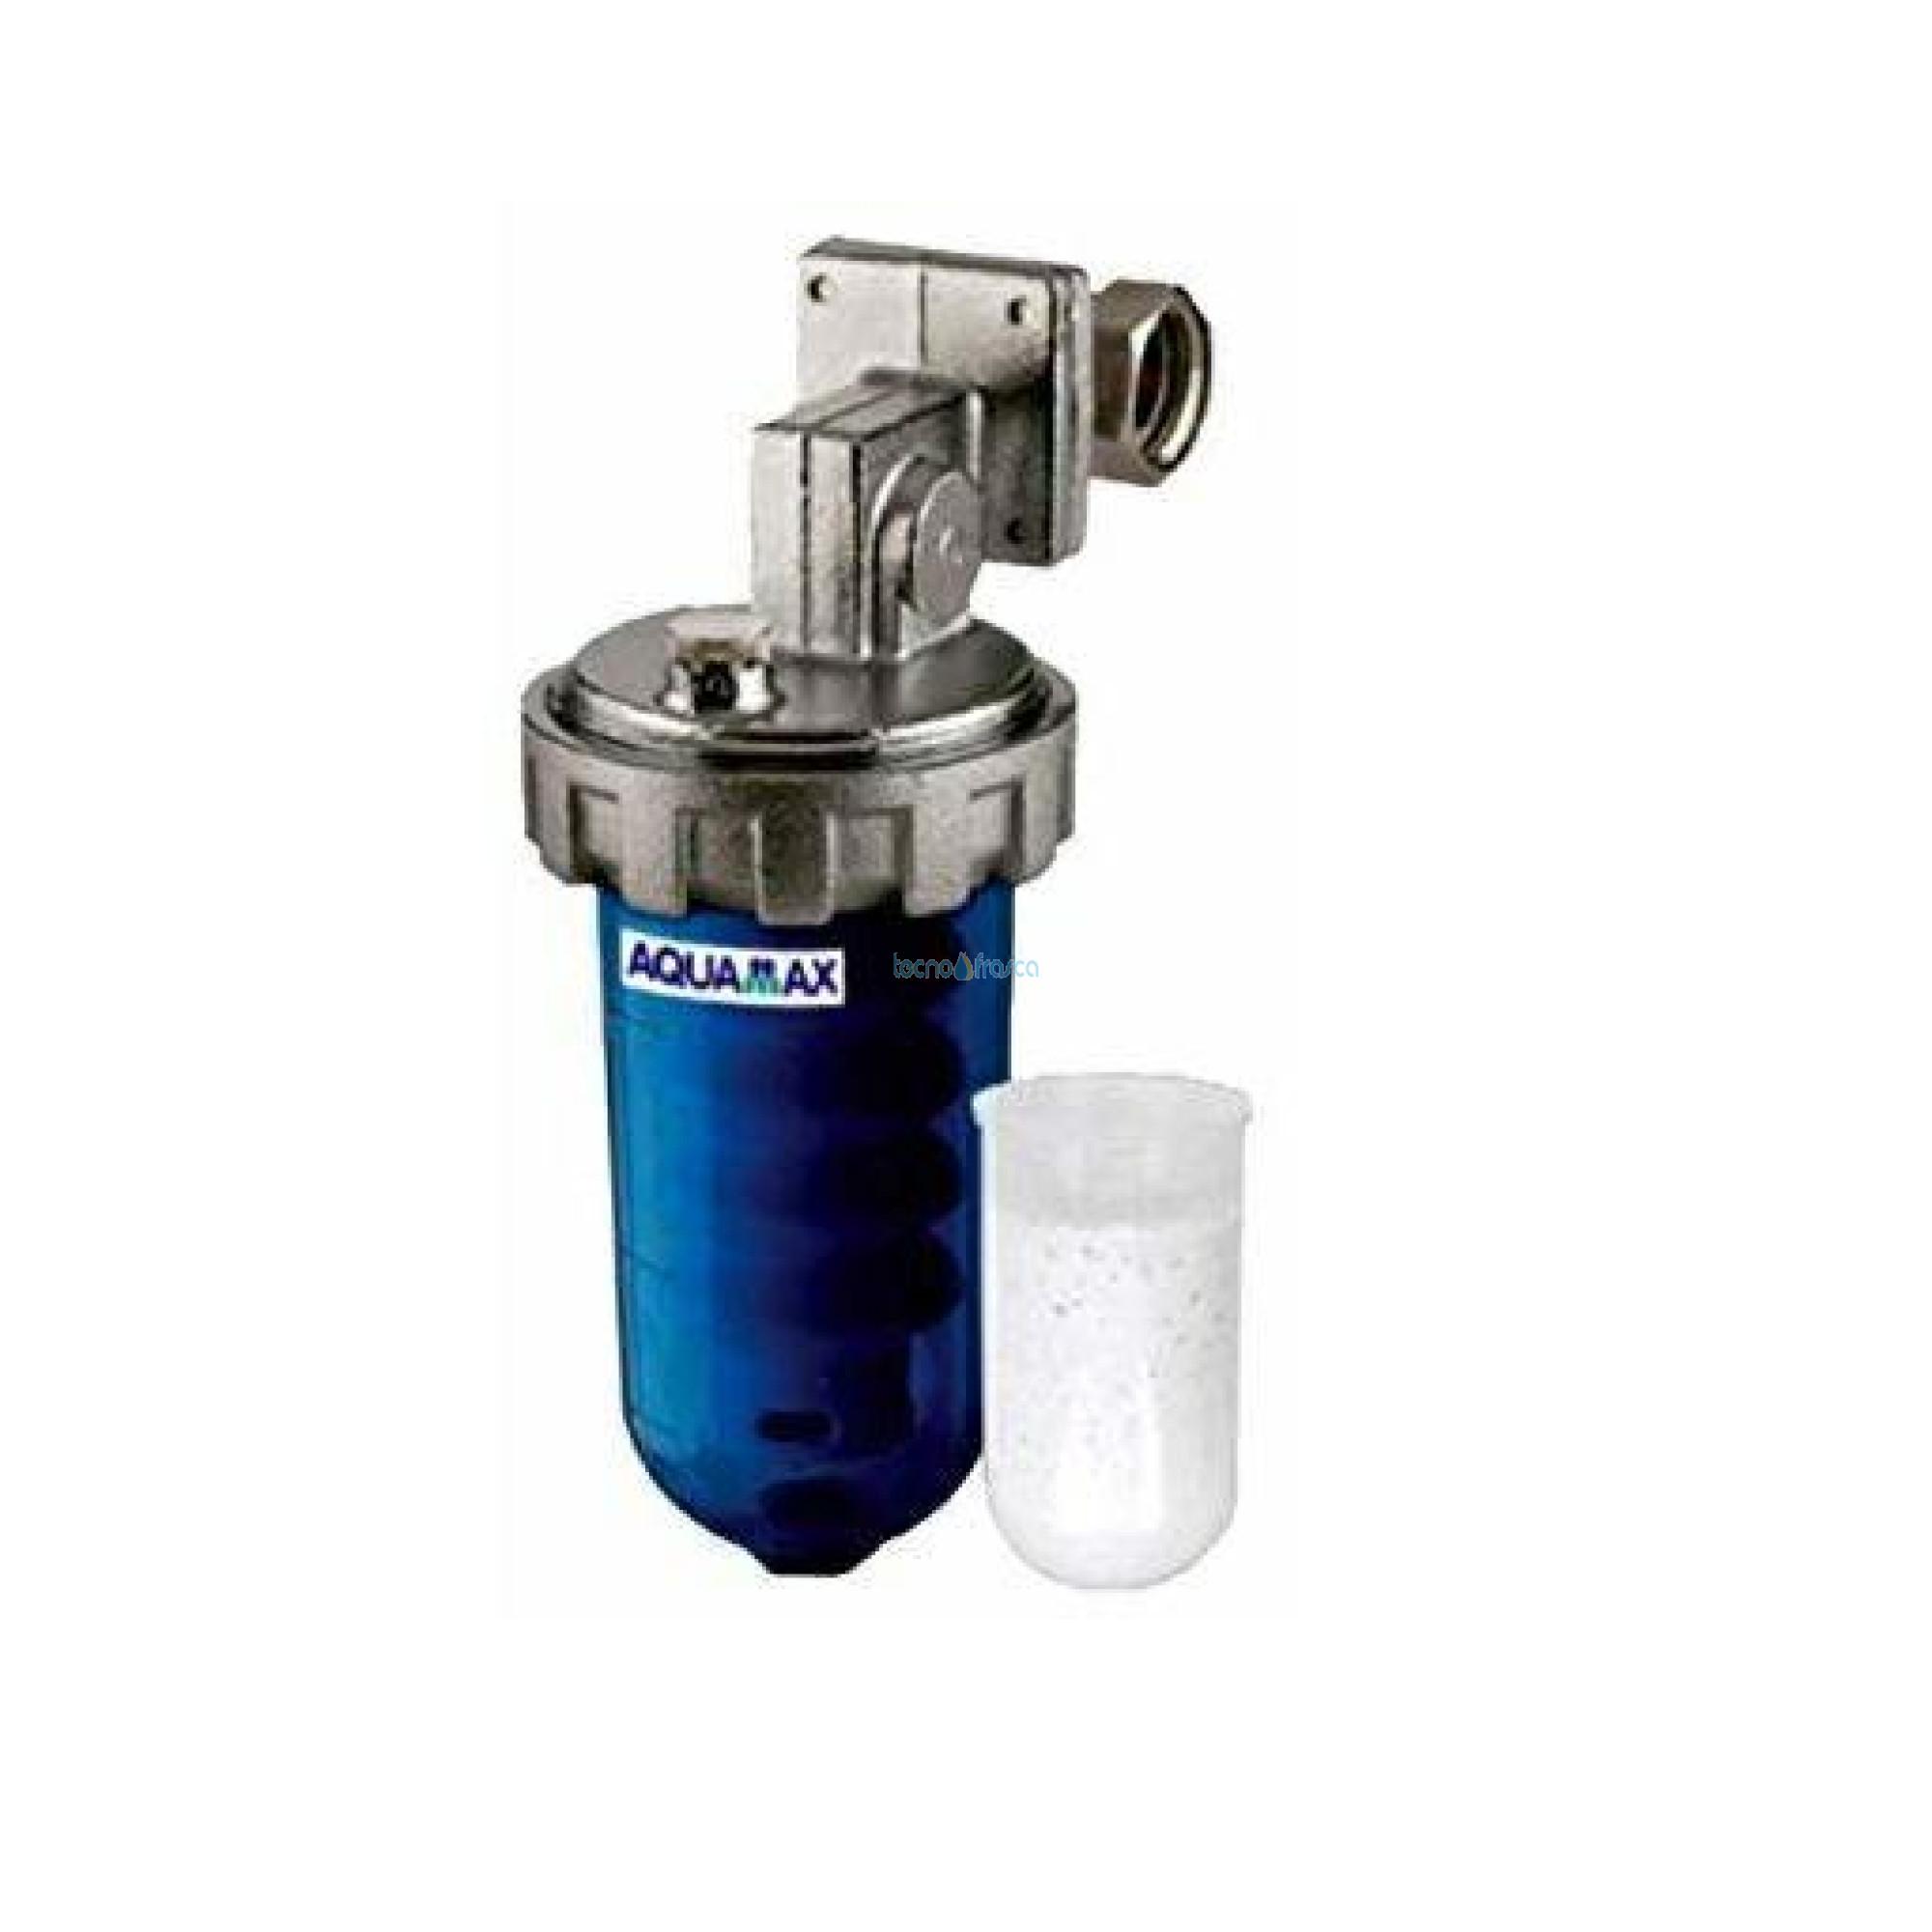 Dosatore Polifosfati dosamax blu 3p attacco ghiere aquamax 10160010